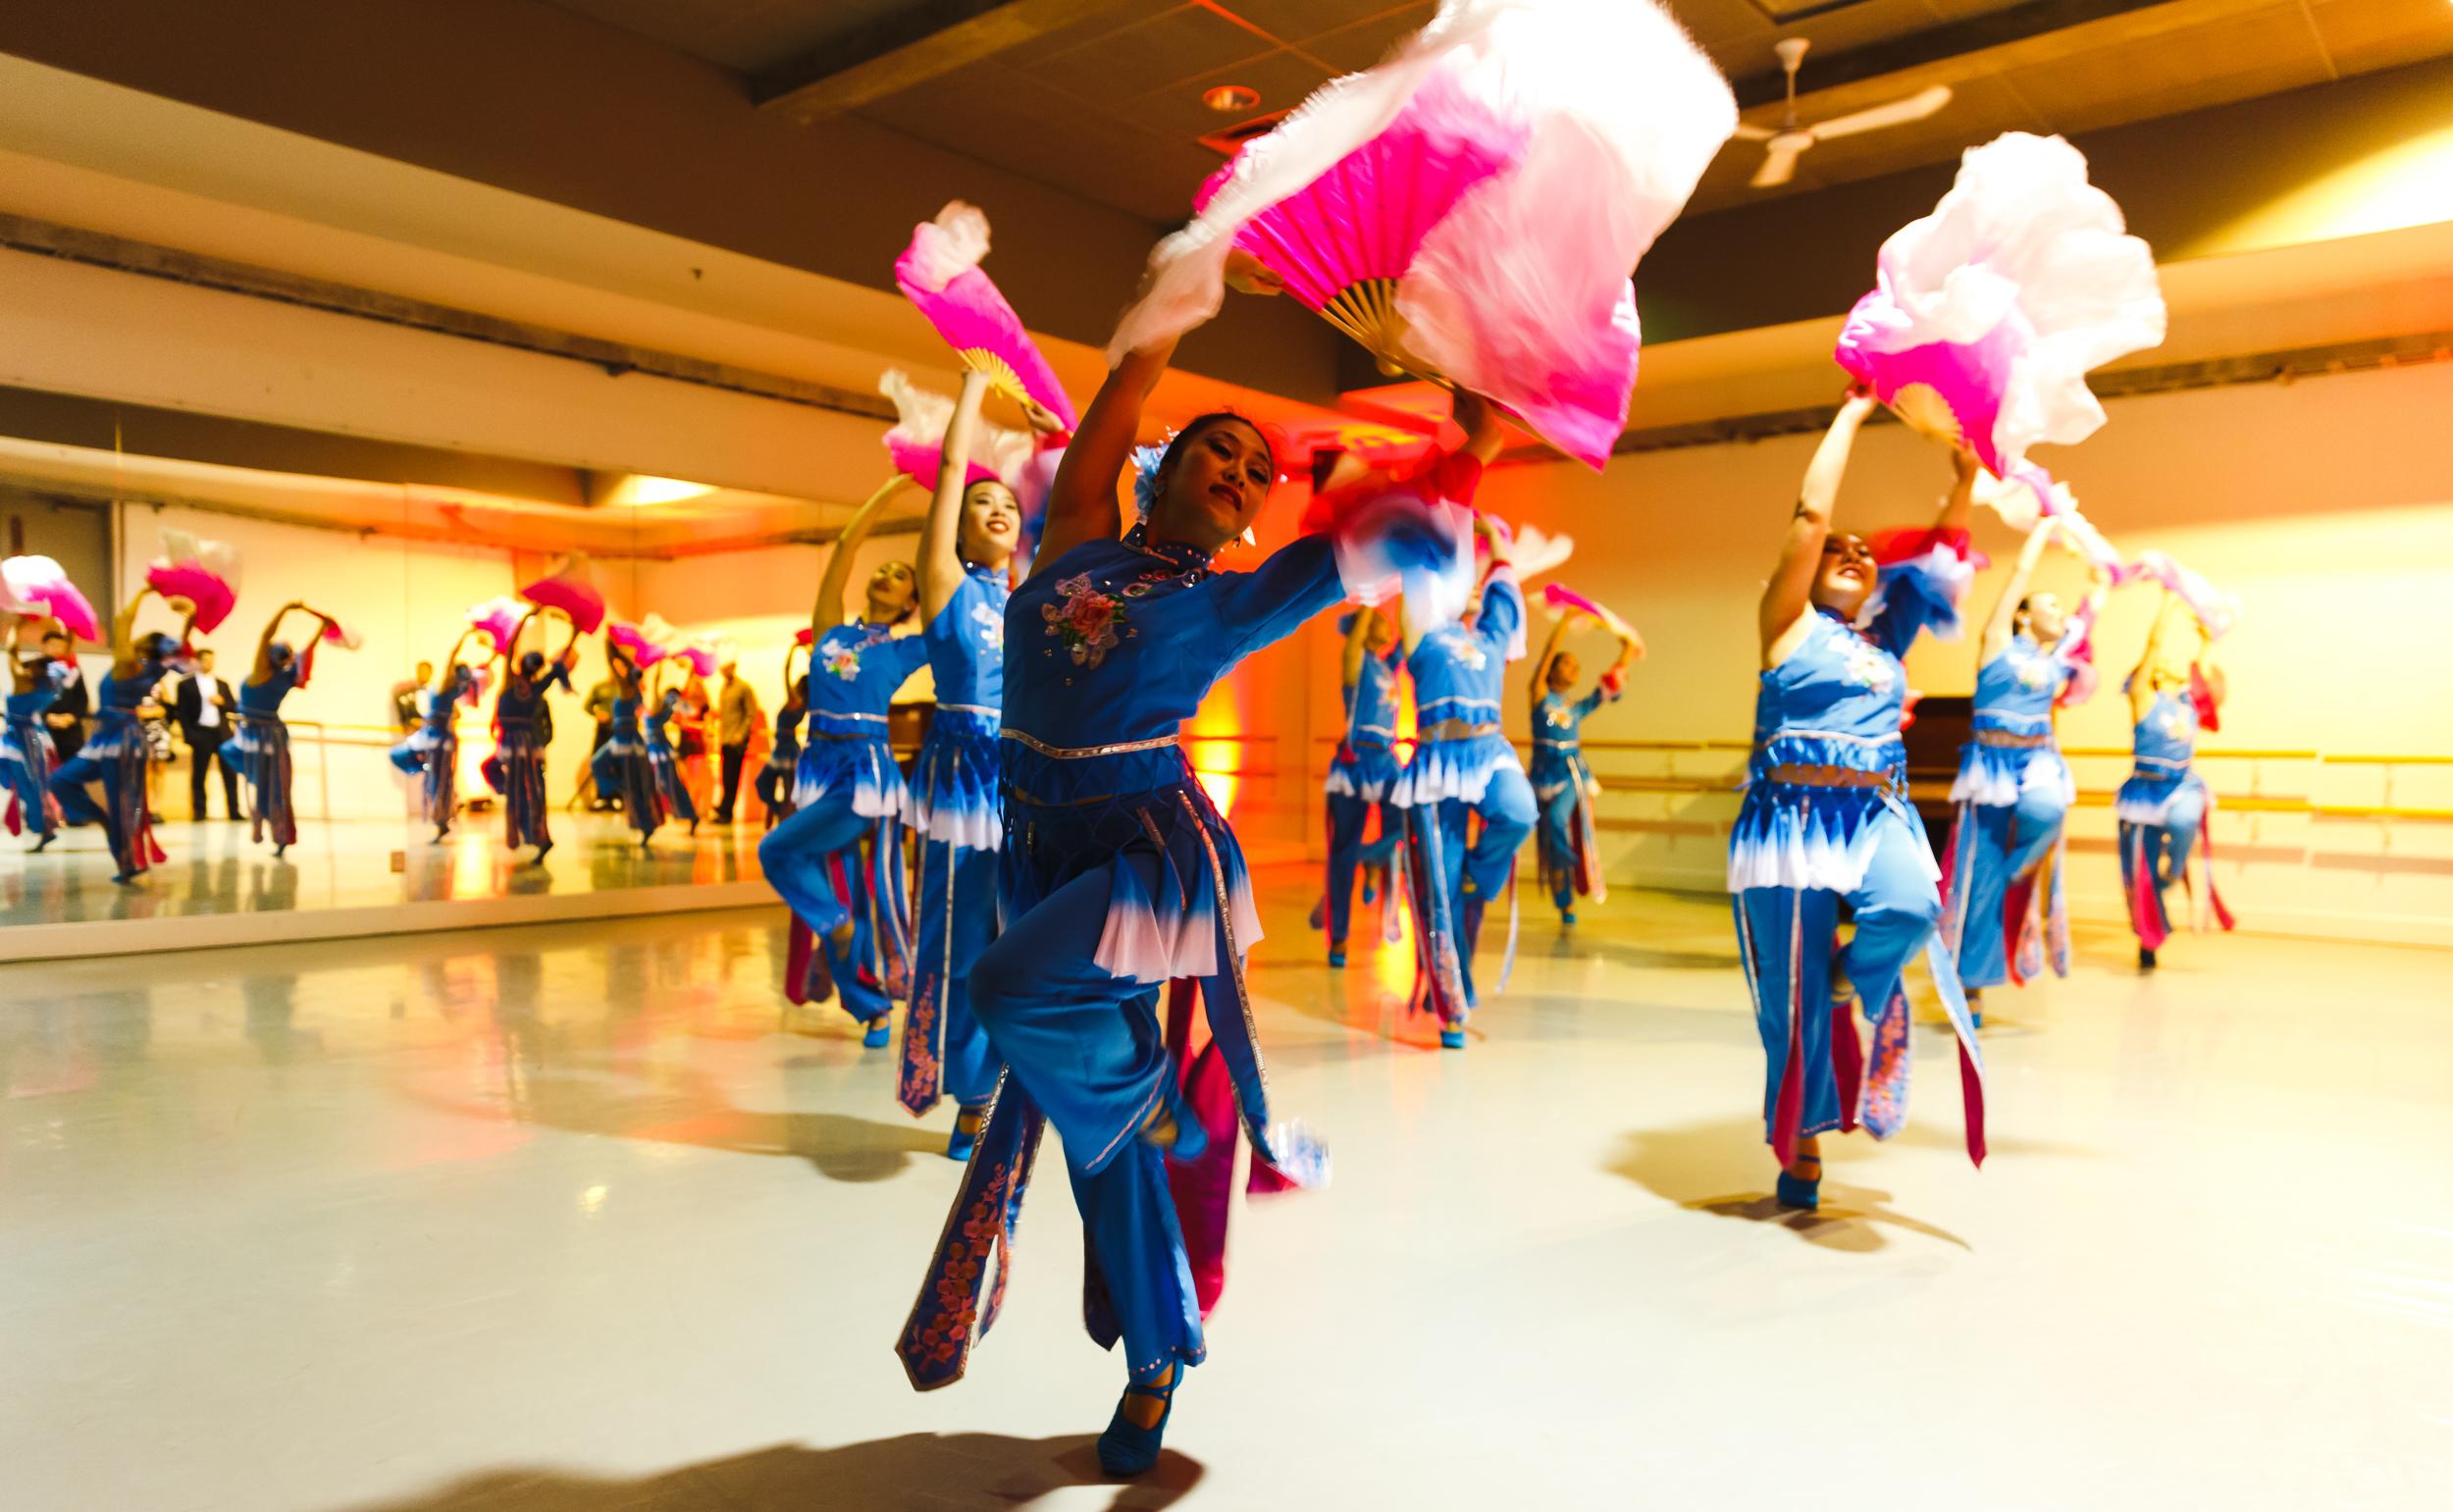 Scotiabank-Dance-Hotel-image17.jpg